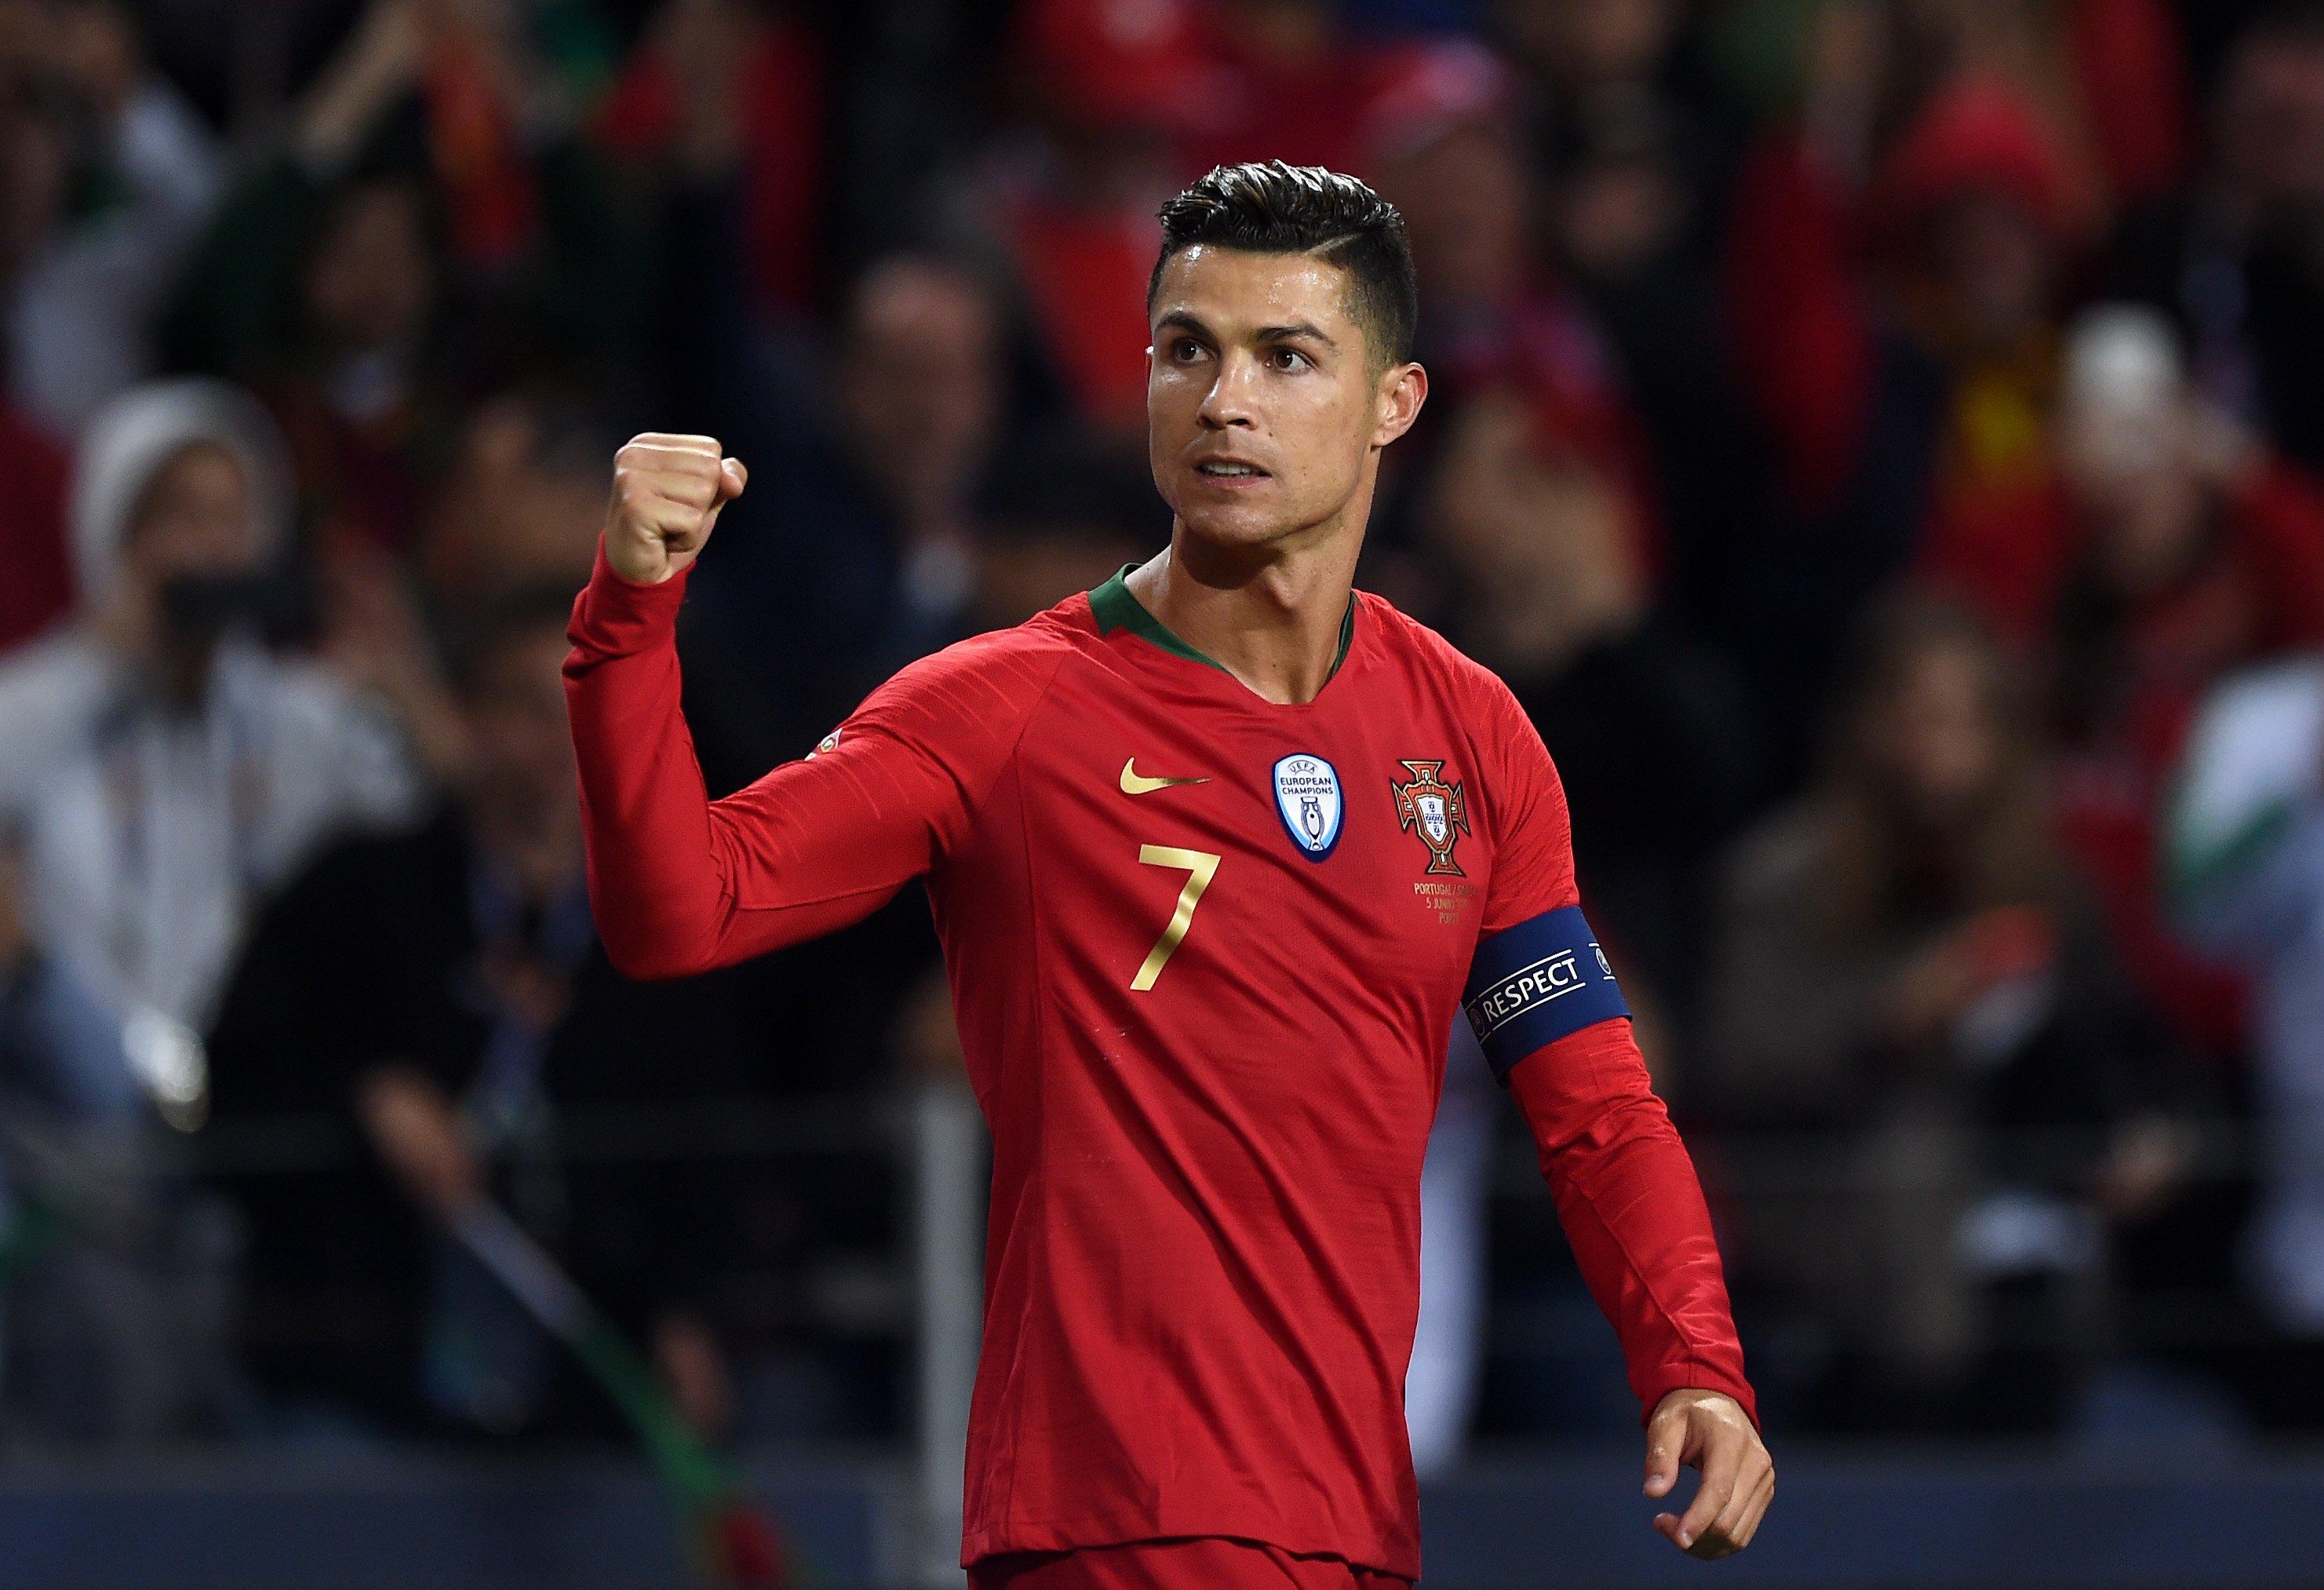 livraison gratuite a98c6 2516d Finally, Ronaldo opens up about how he became superstar